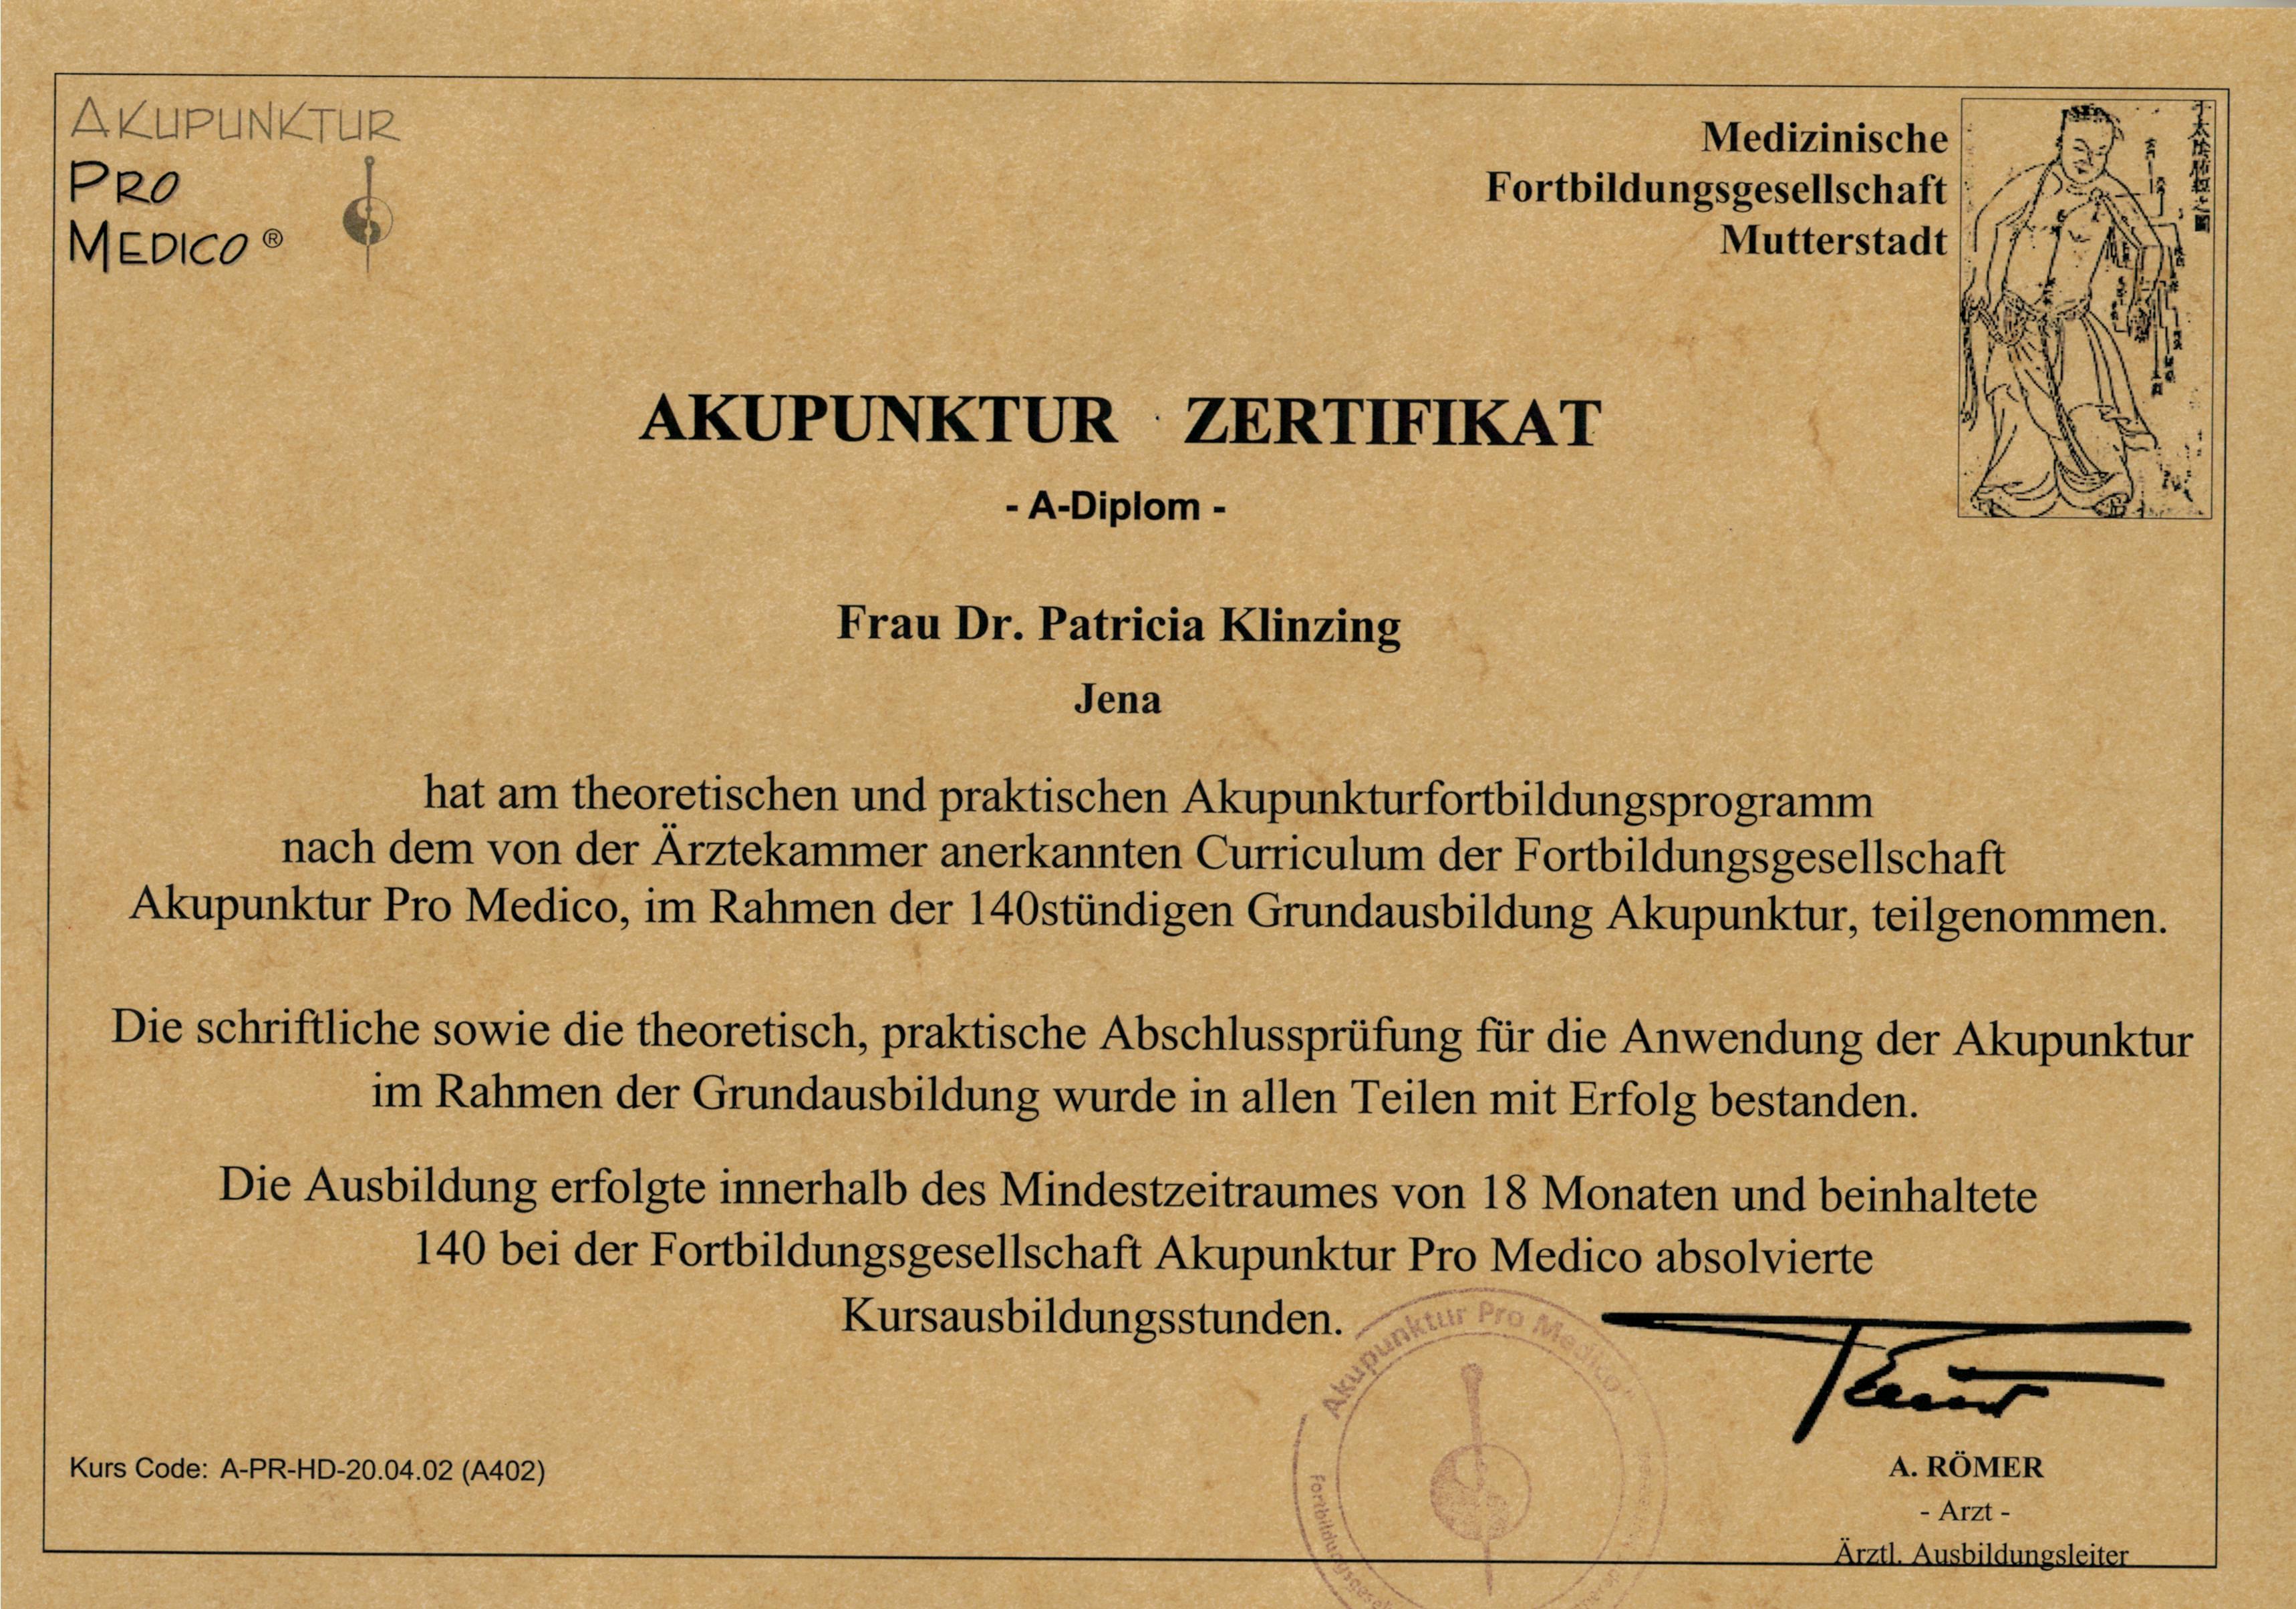 Akupunktur A- Diplom Klinzing